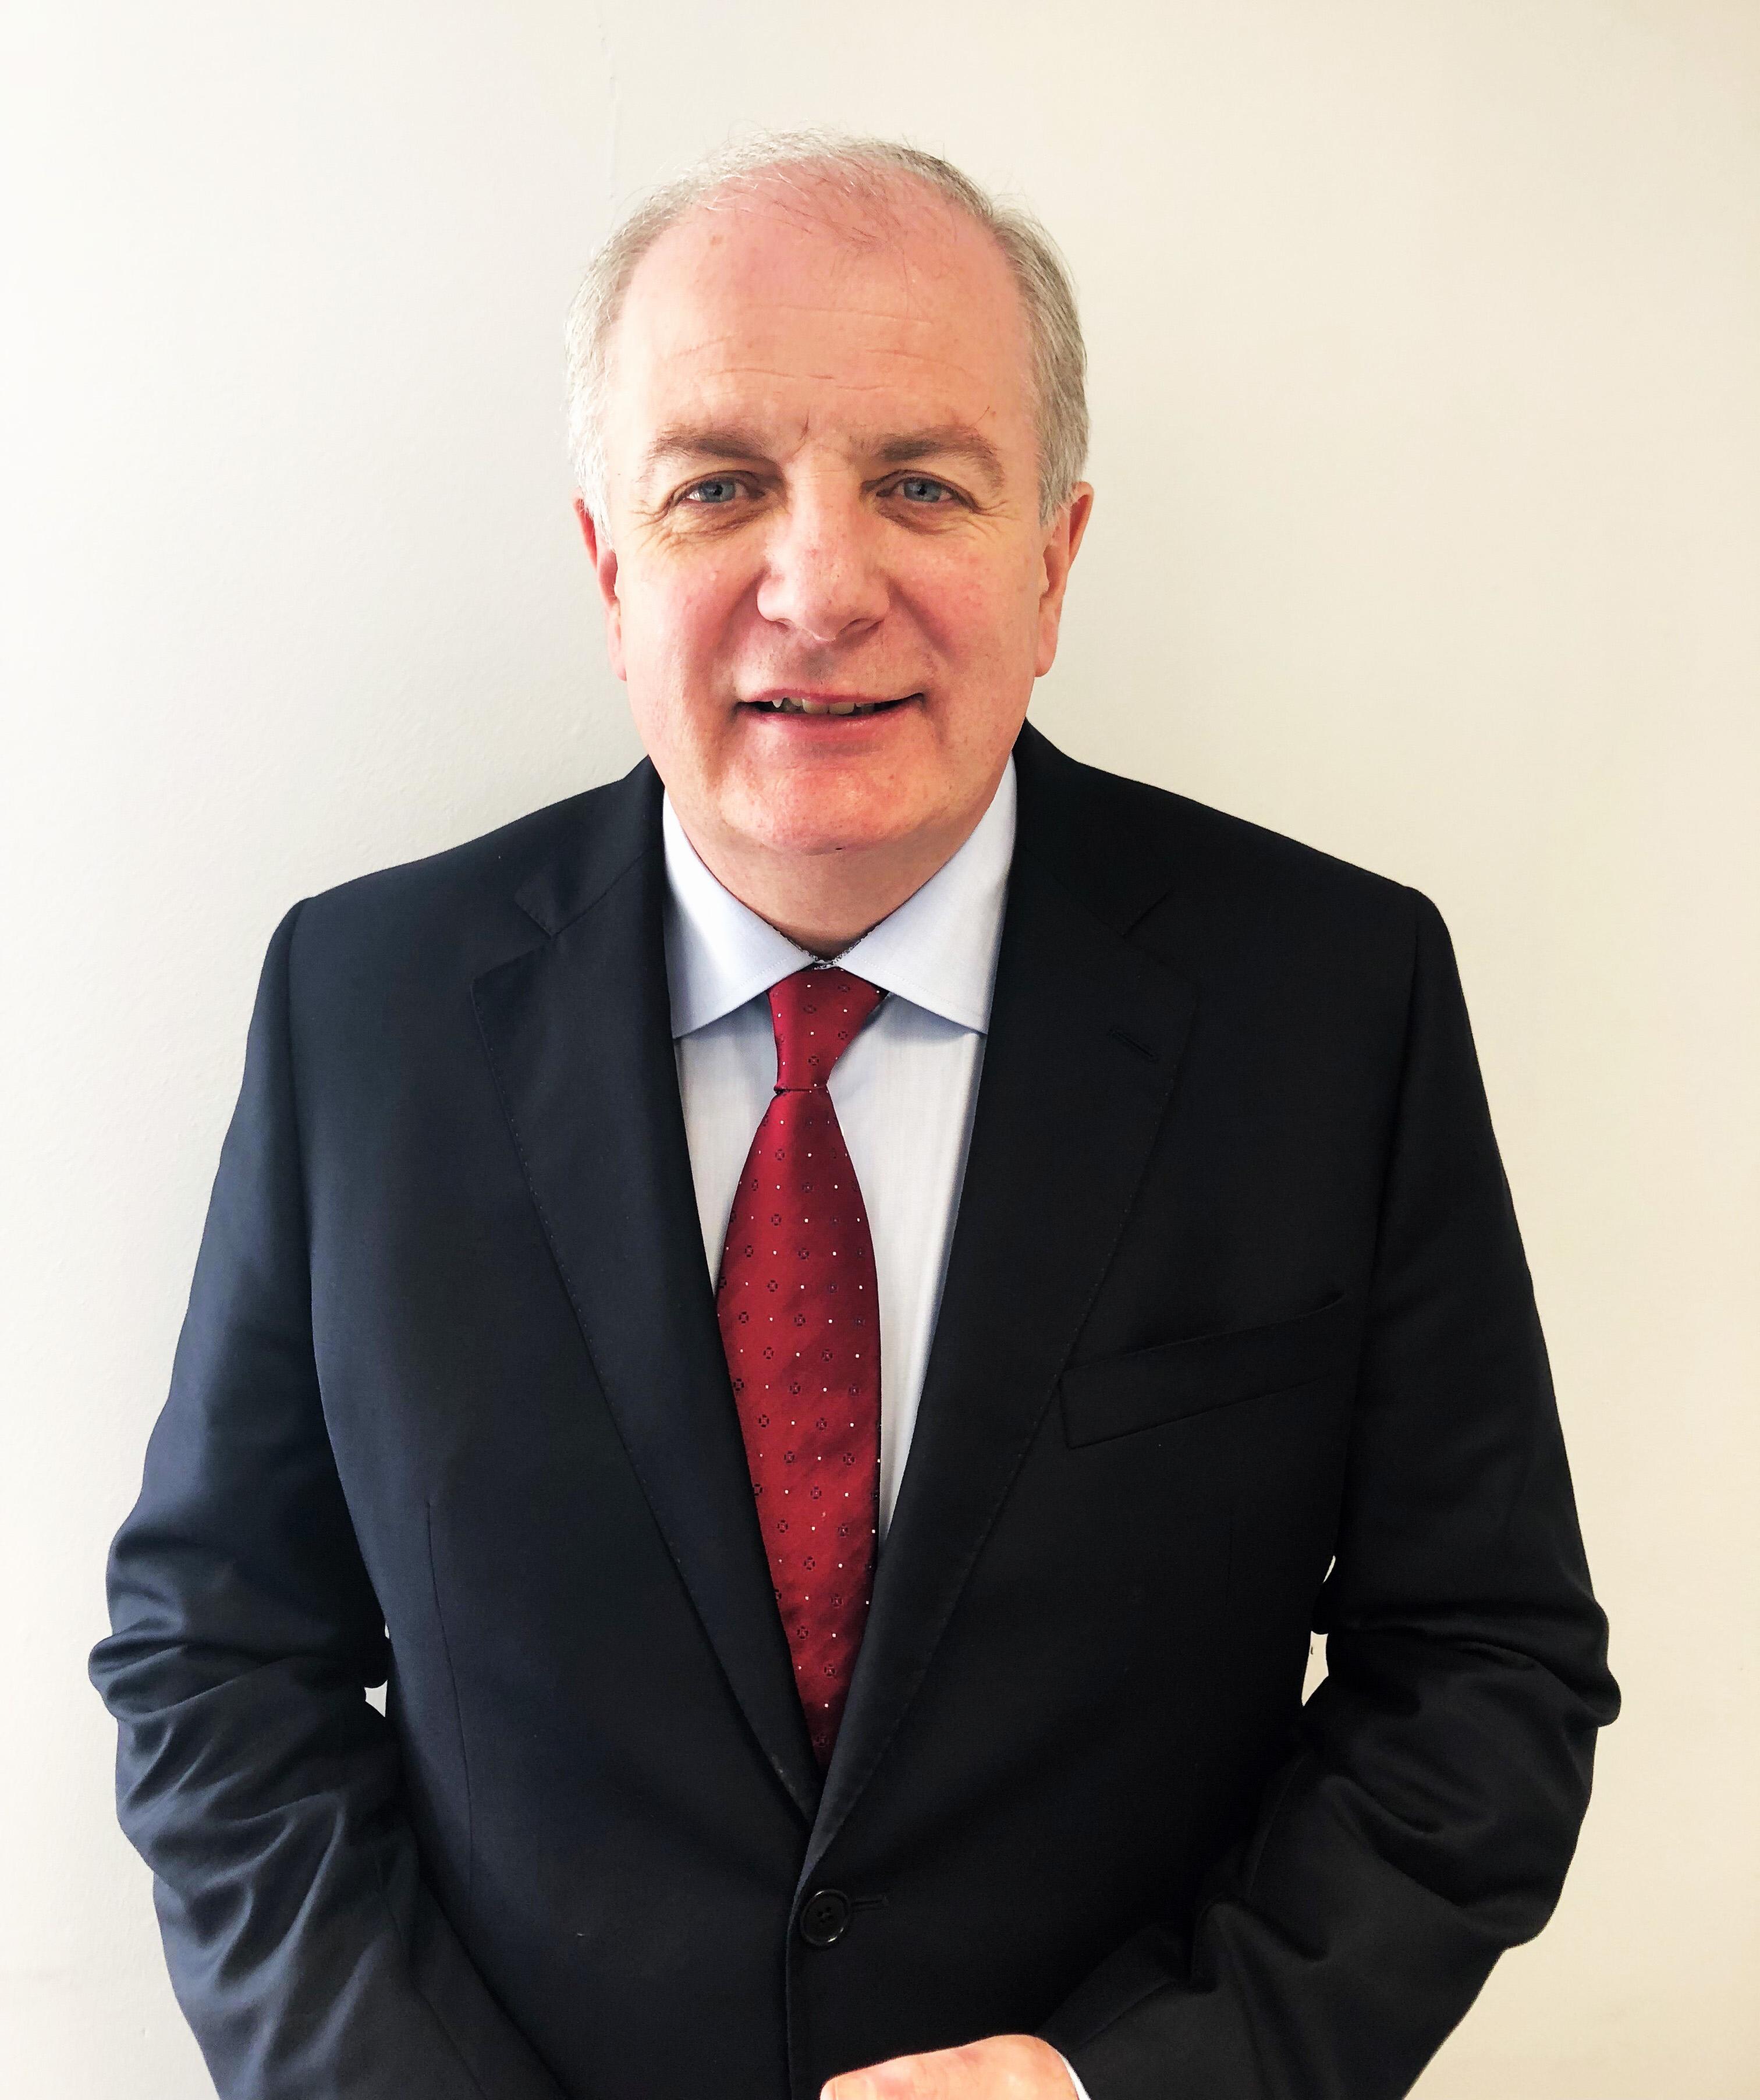 Gavin Duffy Wikipedia